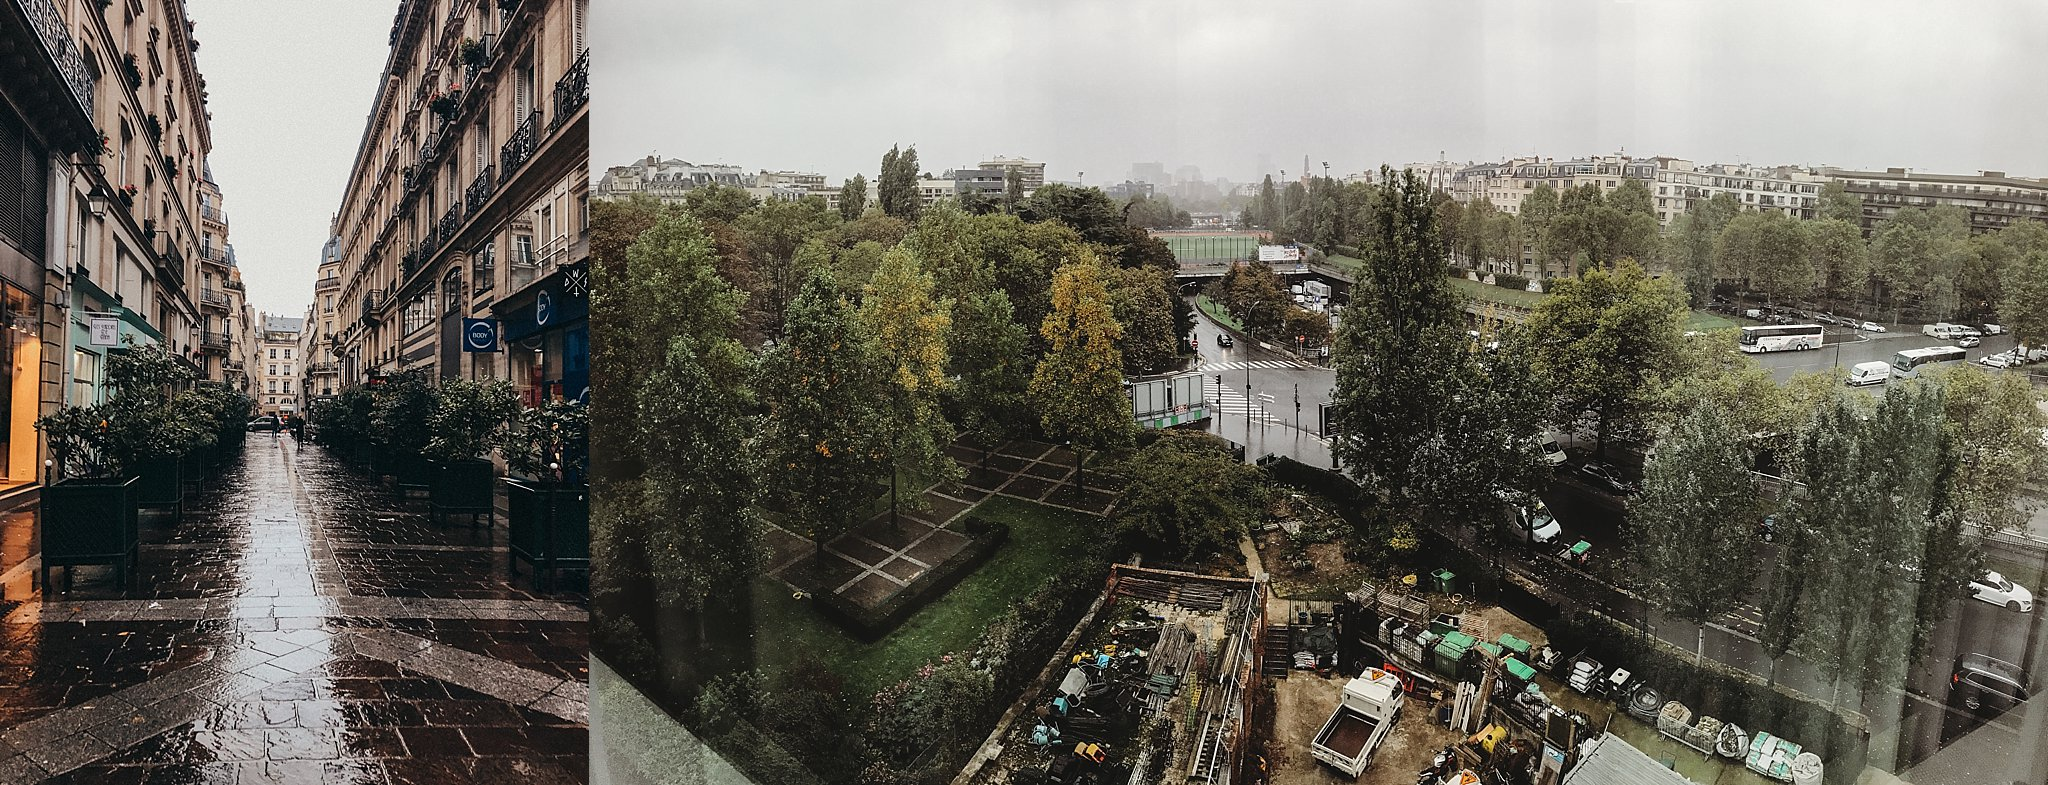 Paris_0006.jpg